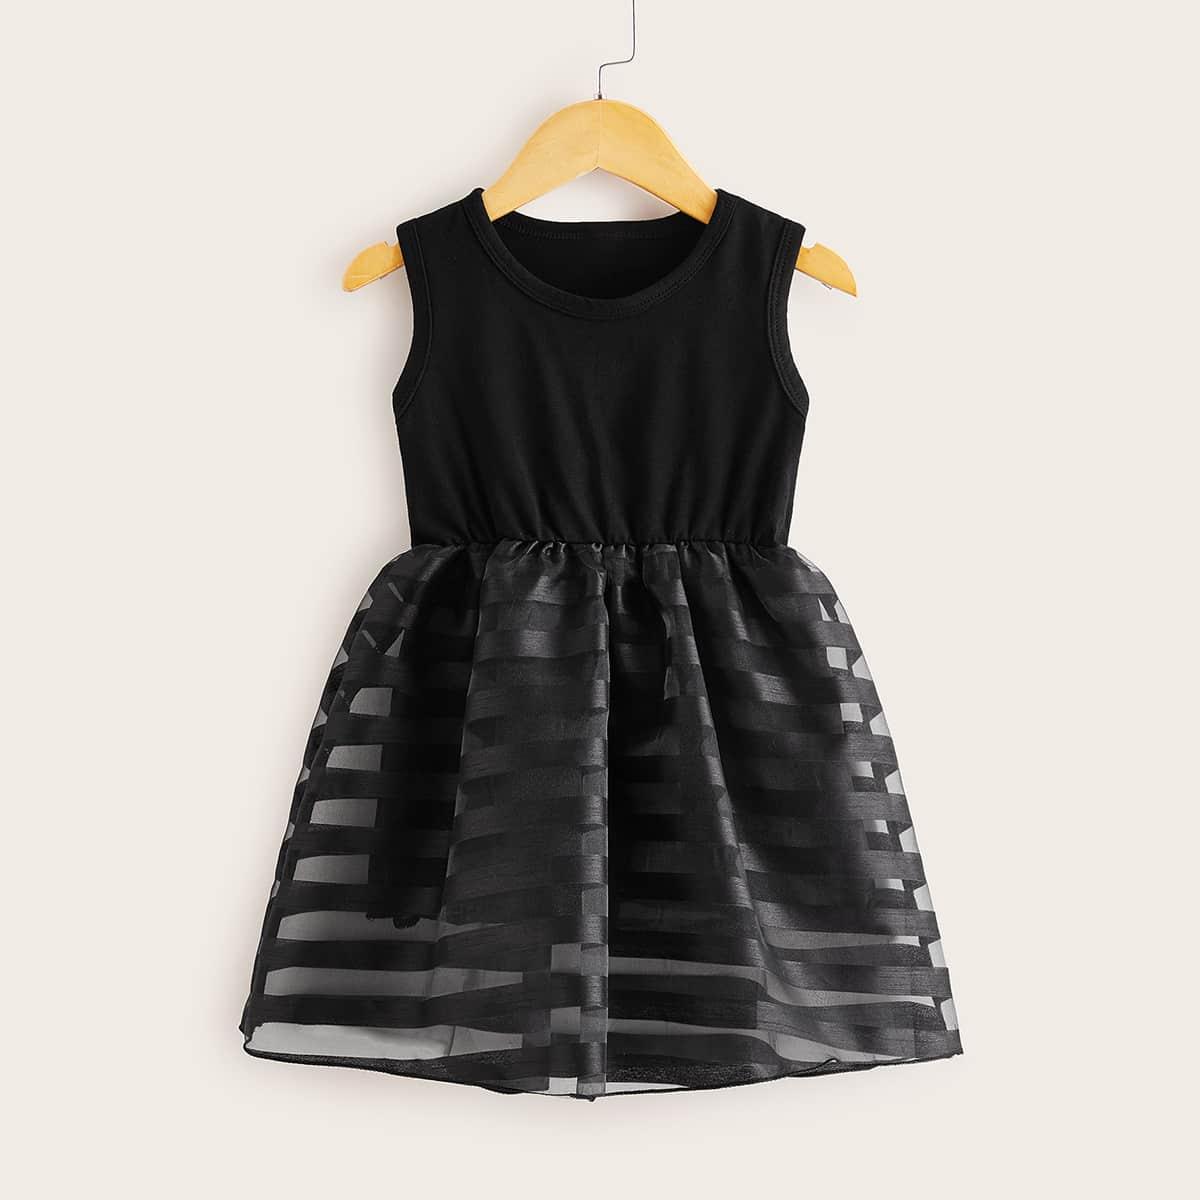 SHEIN / Toddler Girls Mesh Panel A-line Dress